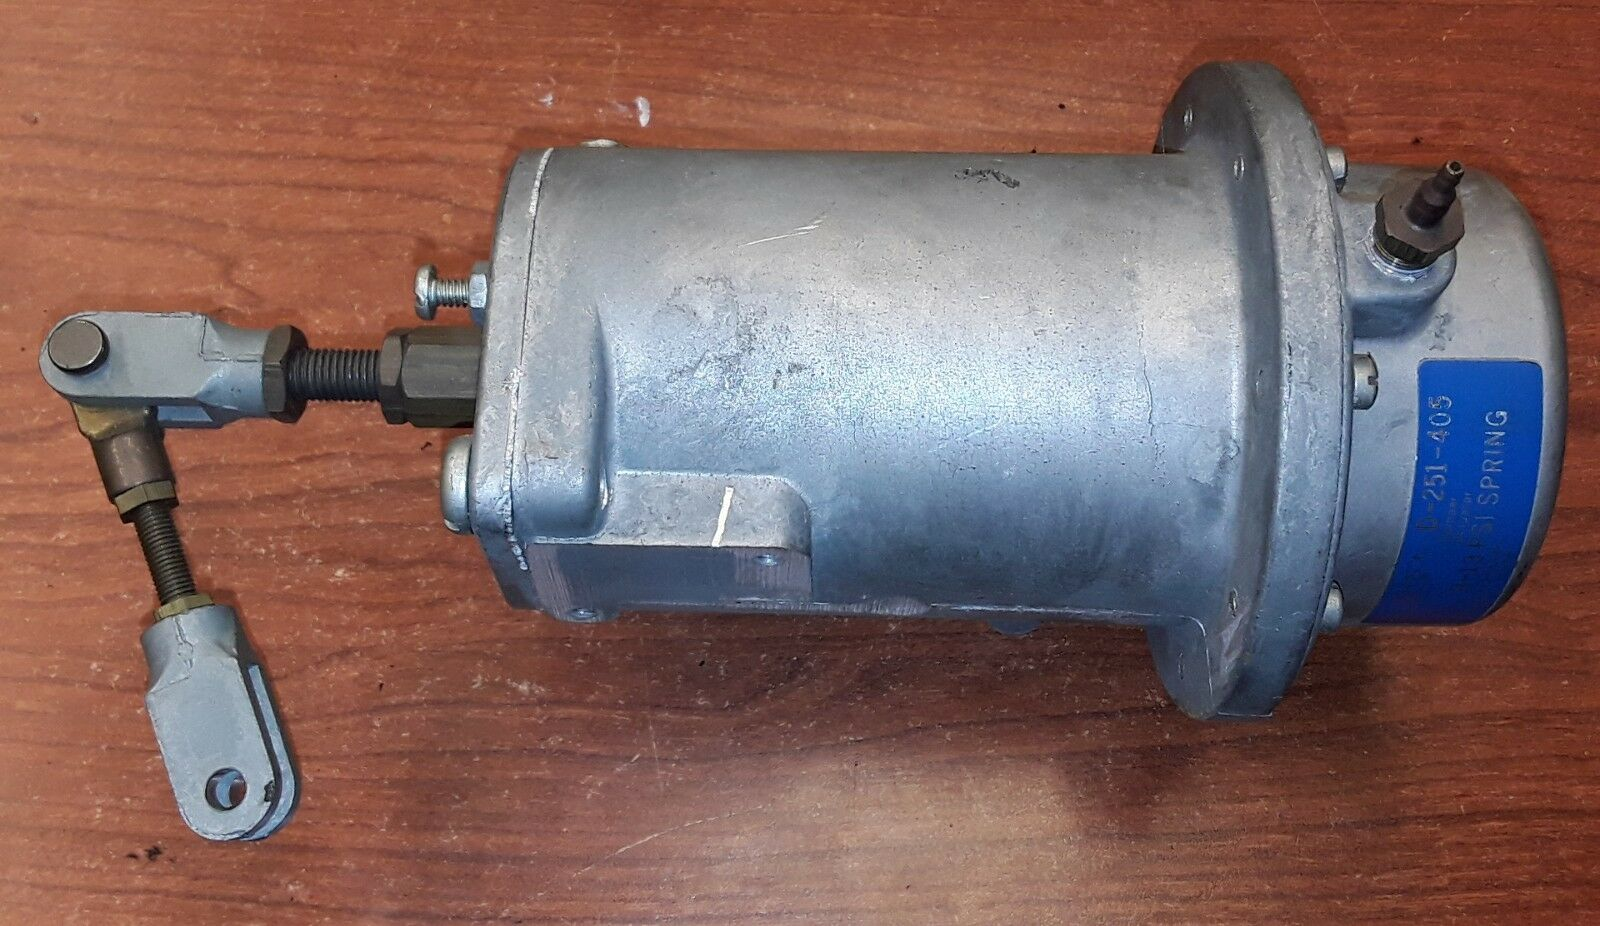 Johnson Controls D-251-405 Damper Actuator 8-13 PSI Spring